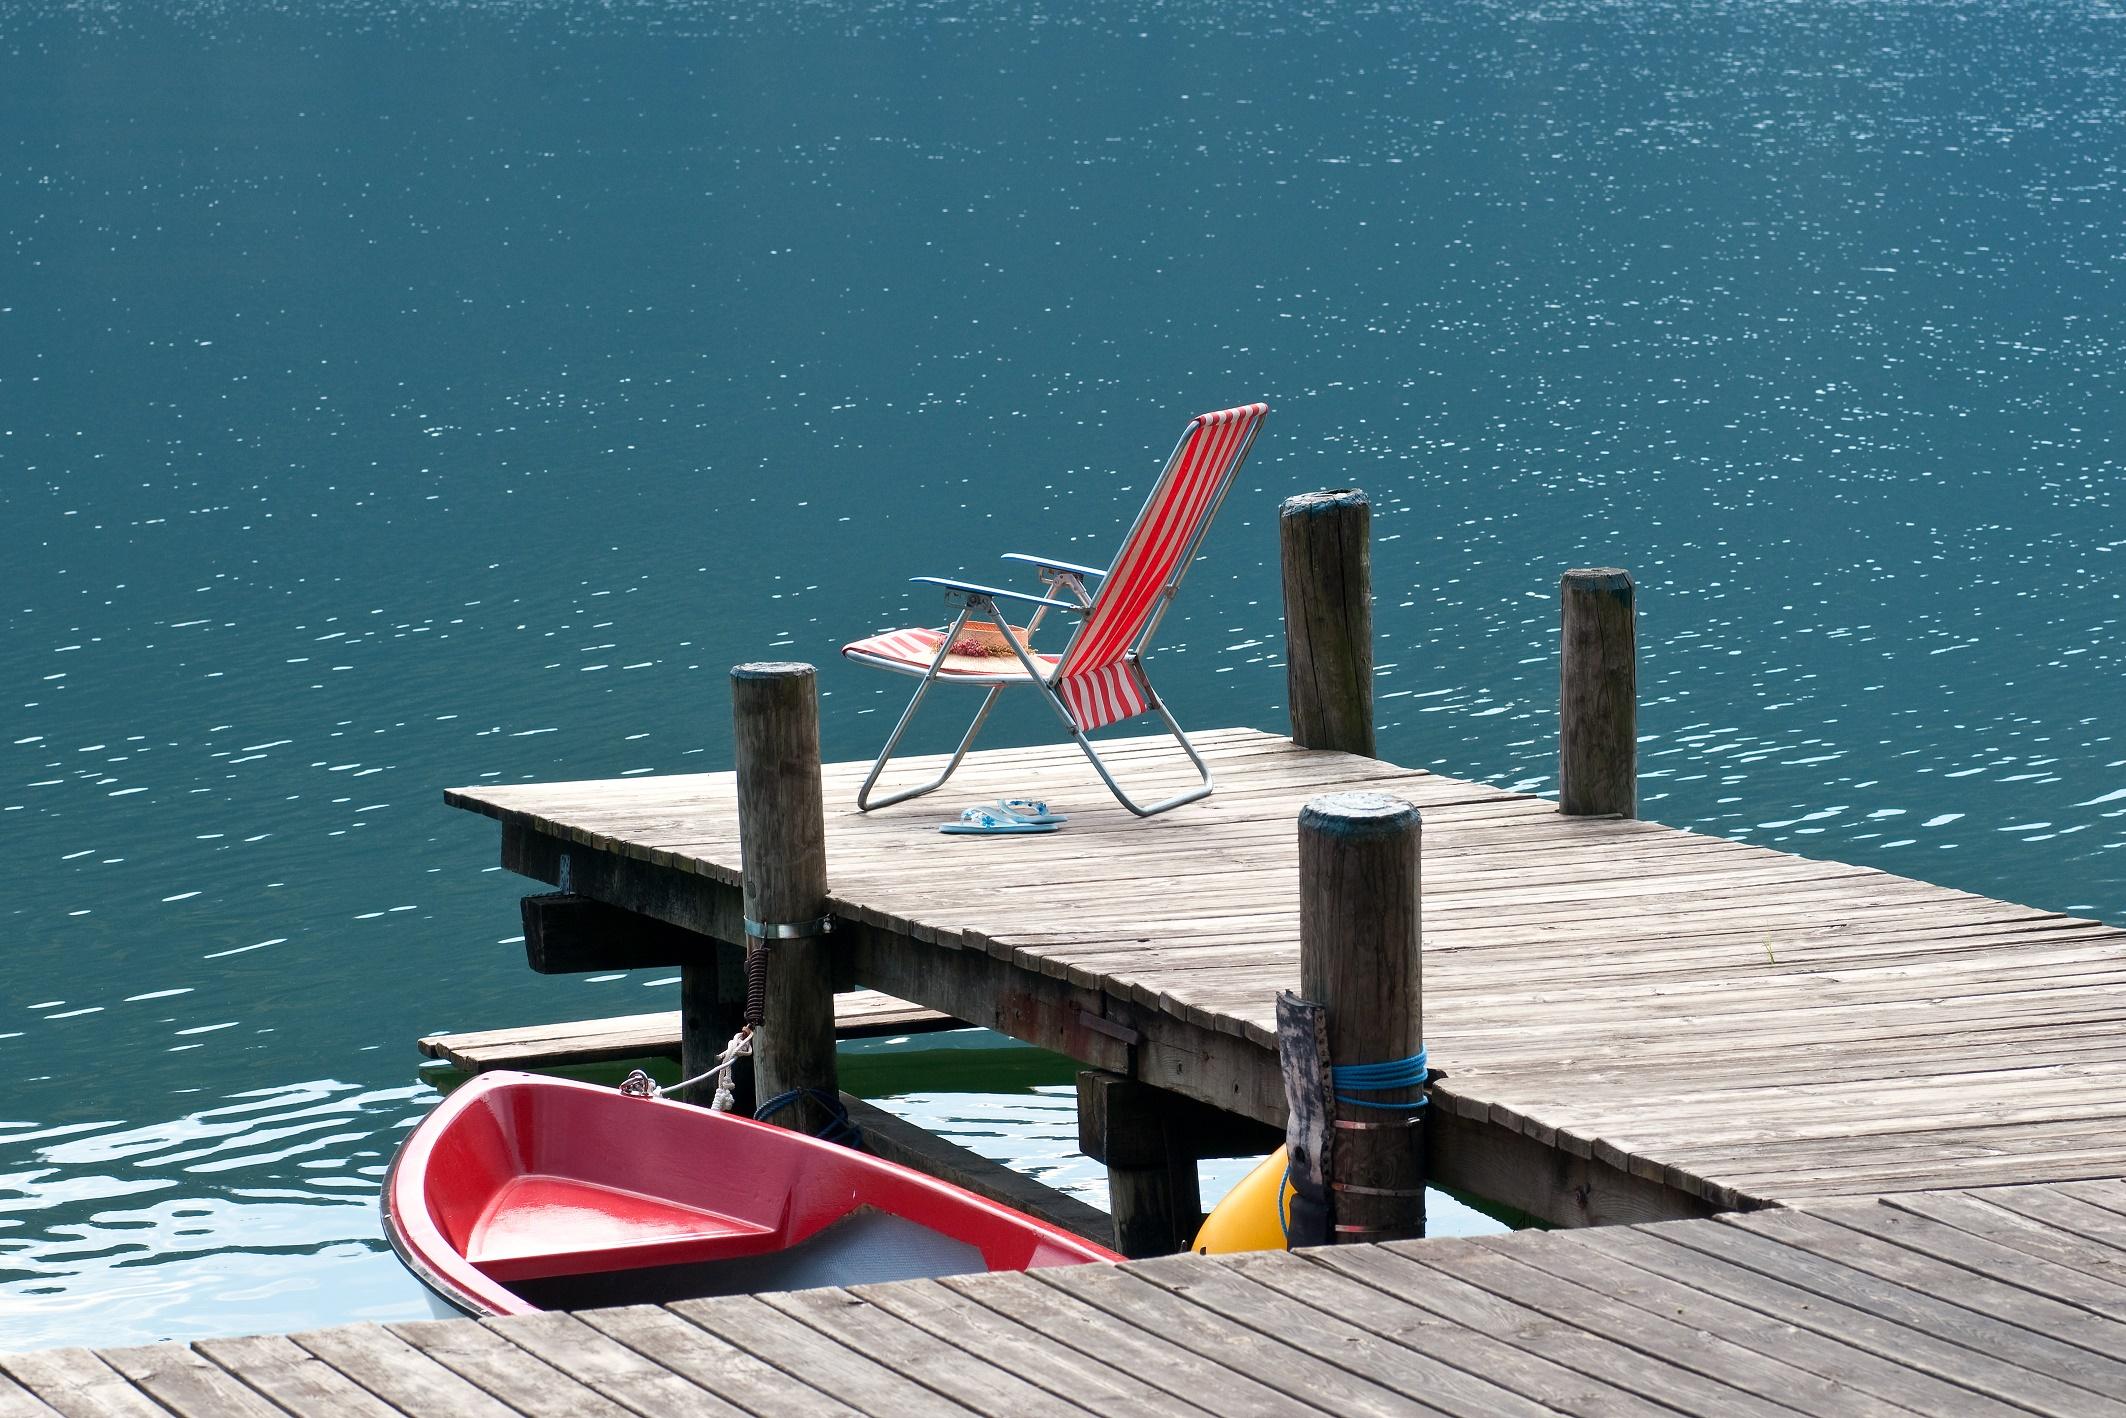 Strandbad02